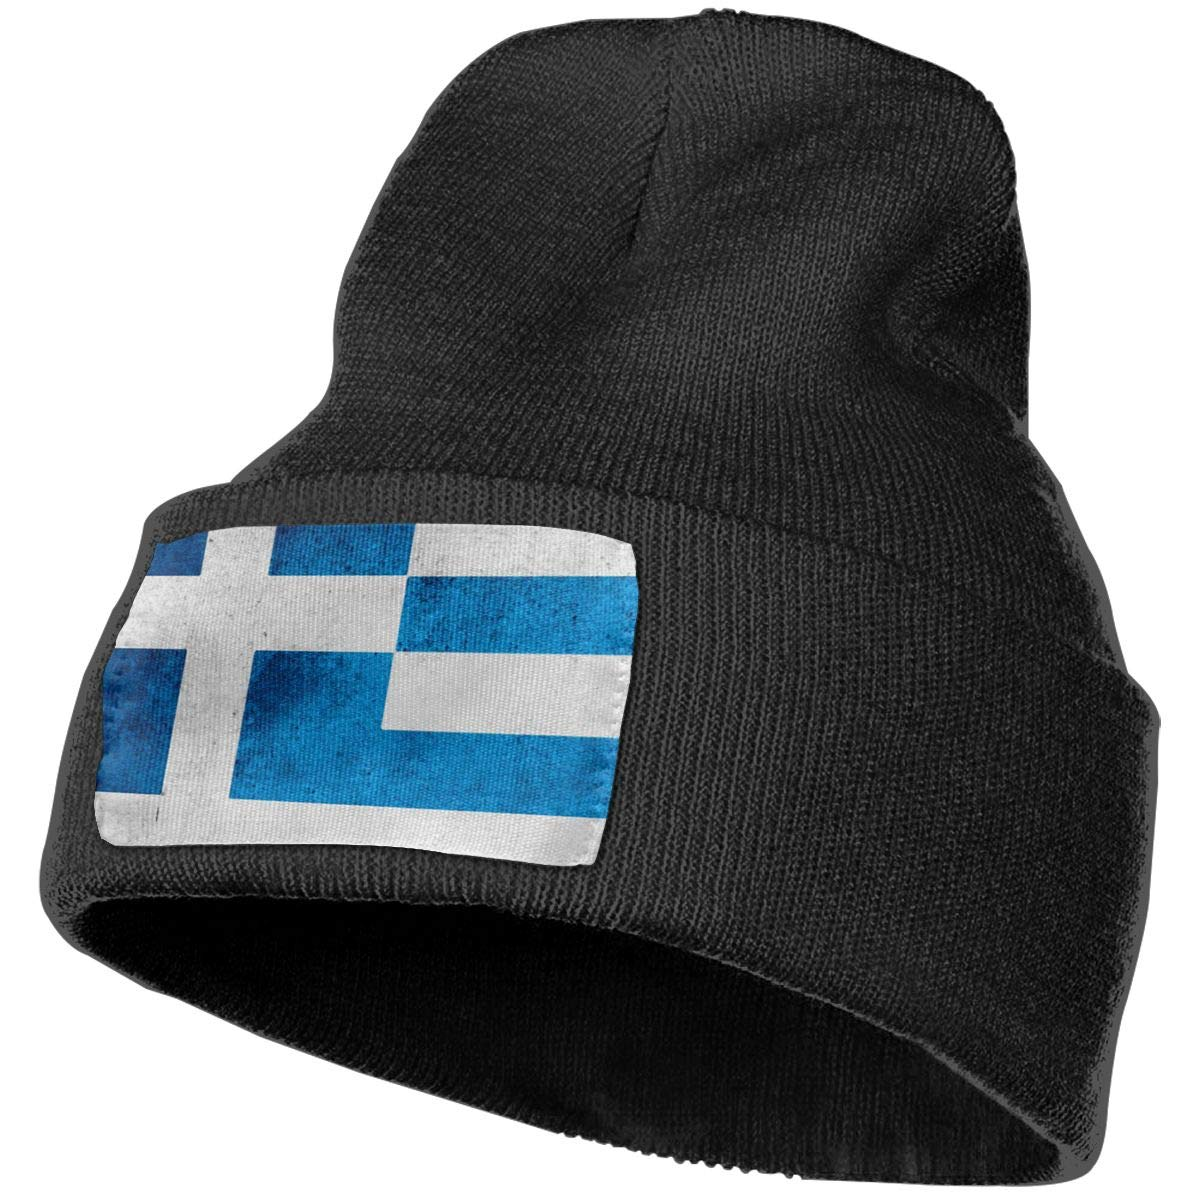 Ruin Greek Flag Fashion Knitting Hat for Men Women 100/% Acrylic Acid Mas Beanie Hat